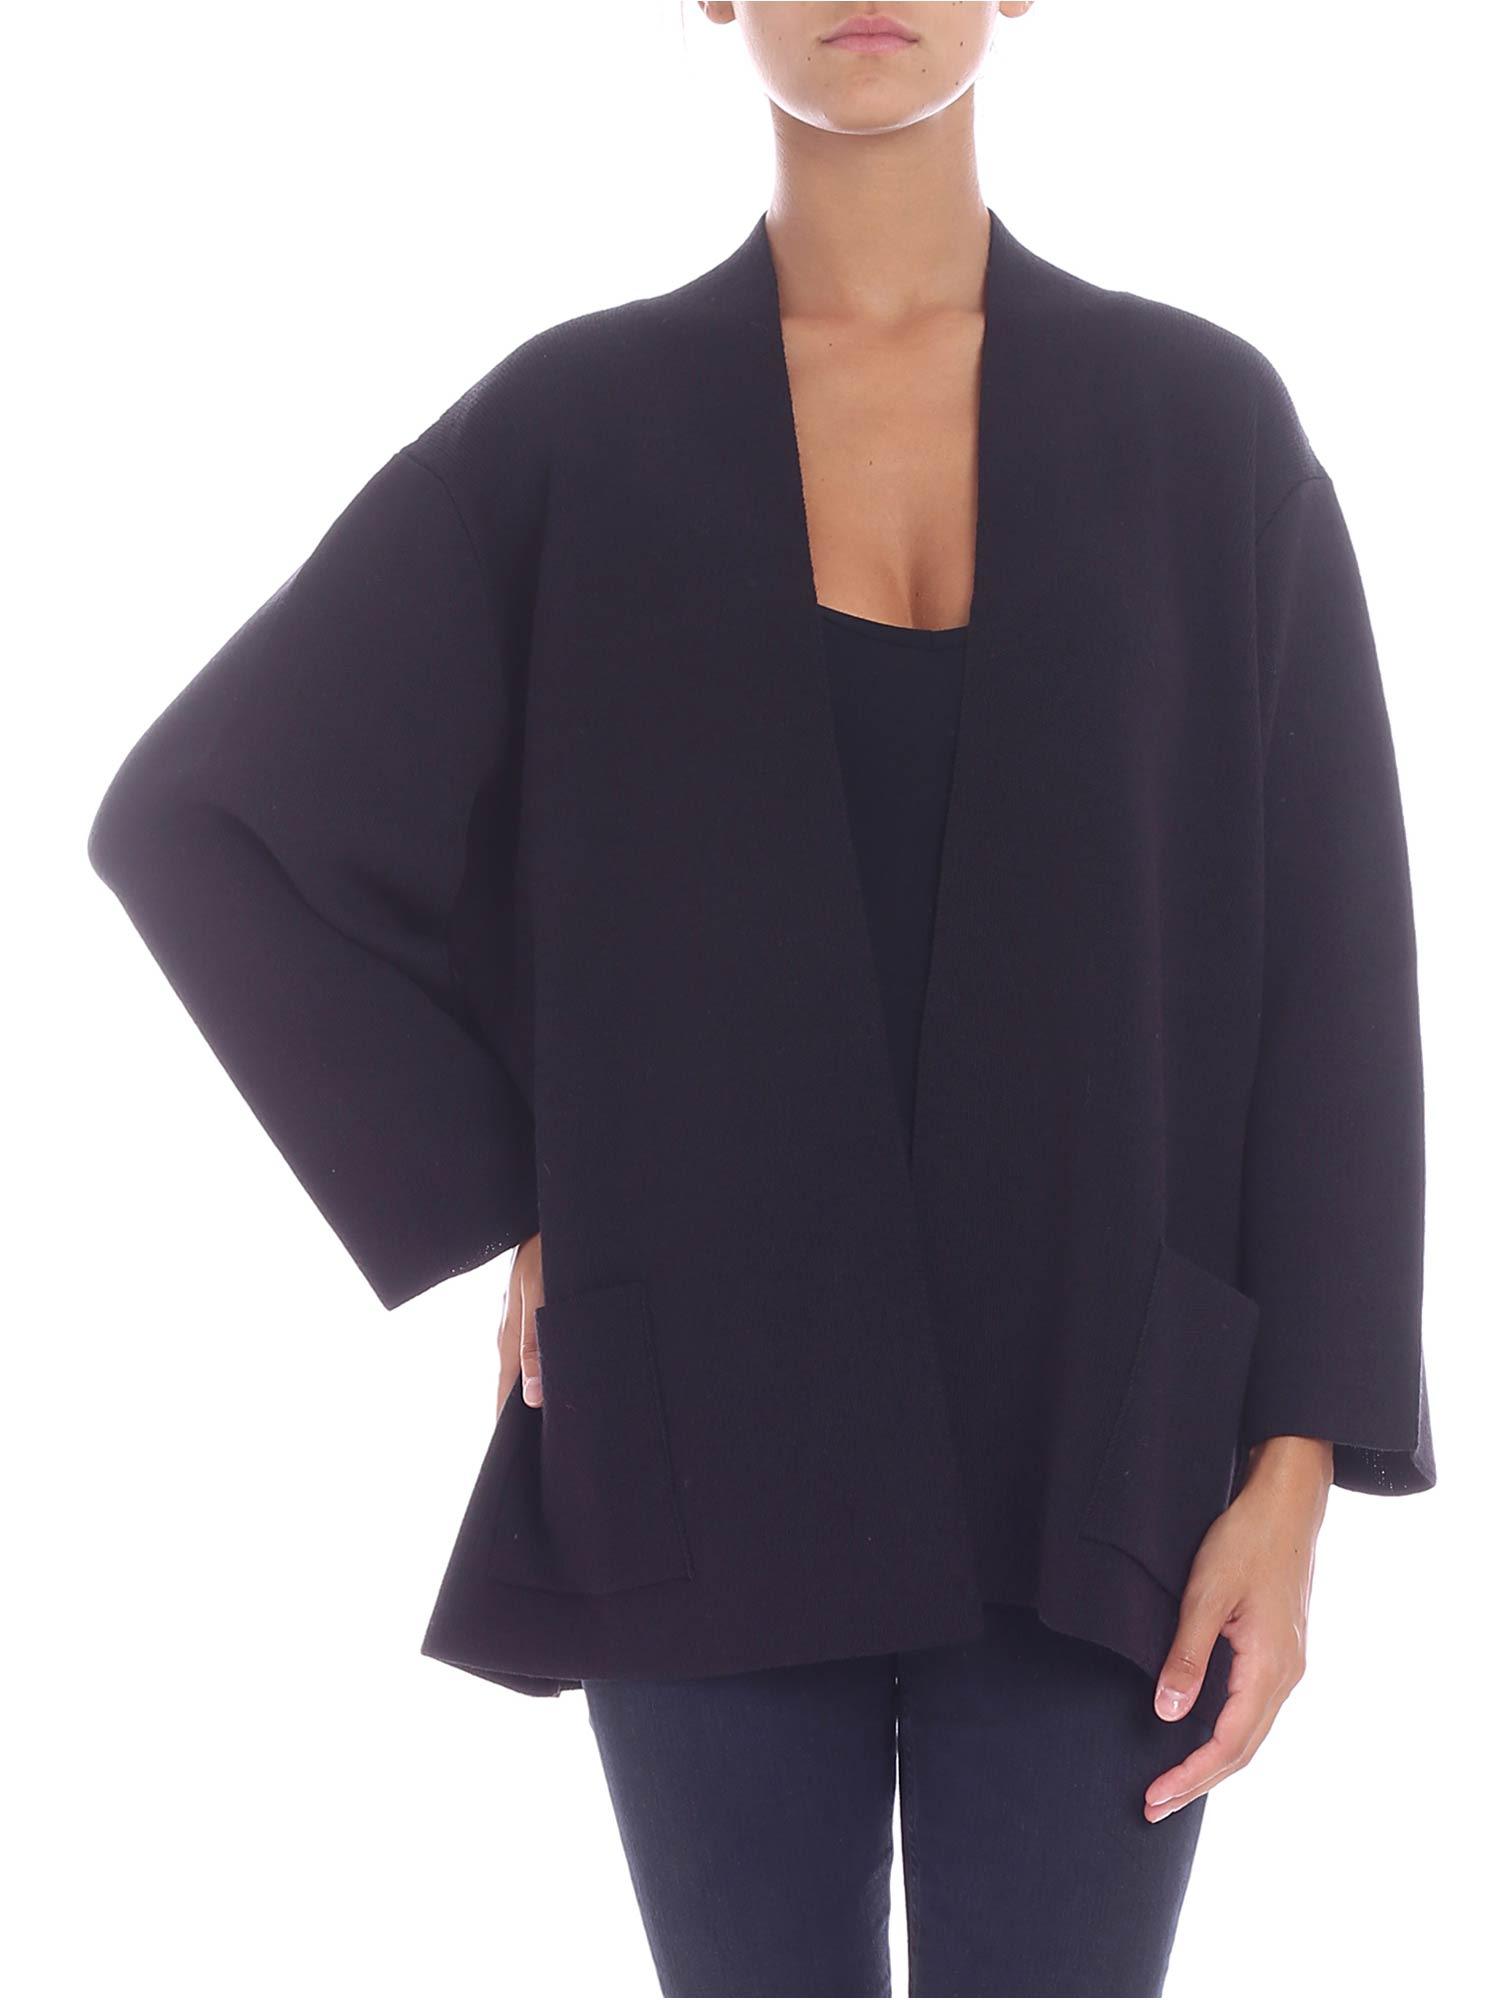 TRUSSARDI Wool Blend Cardigan in Black